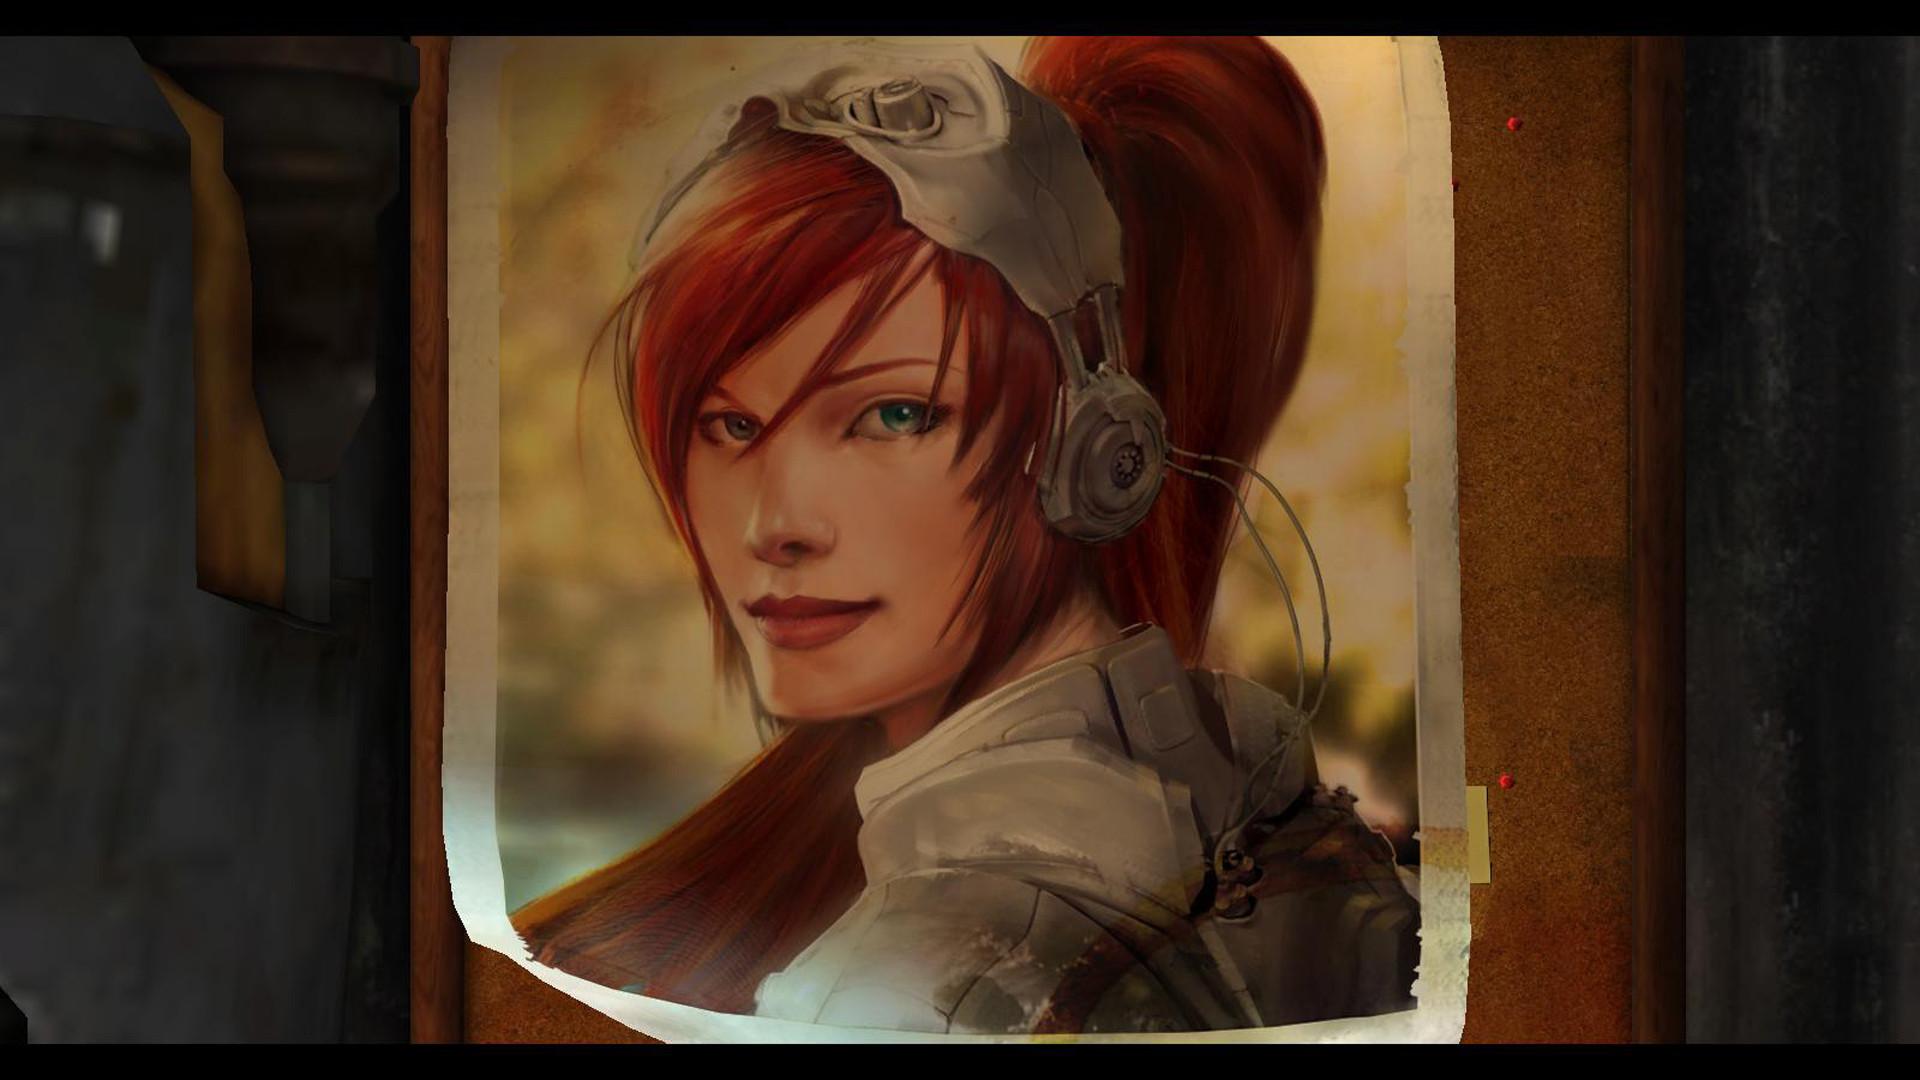 Res: 1920x1080, video games, posters, Sarah Kerrigan Queen Of Blades, StarCraft II - Free  Wallpaper / WallpaperJam.com